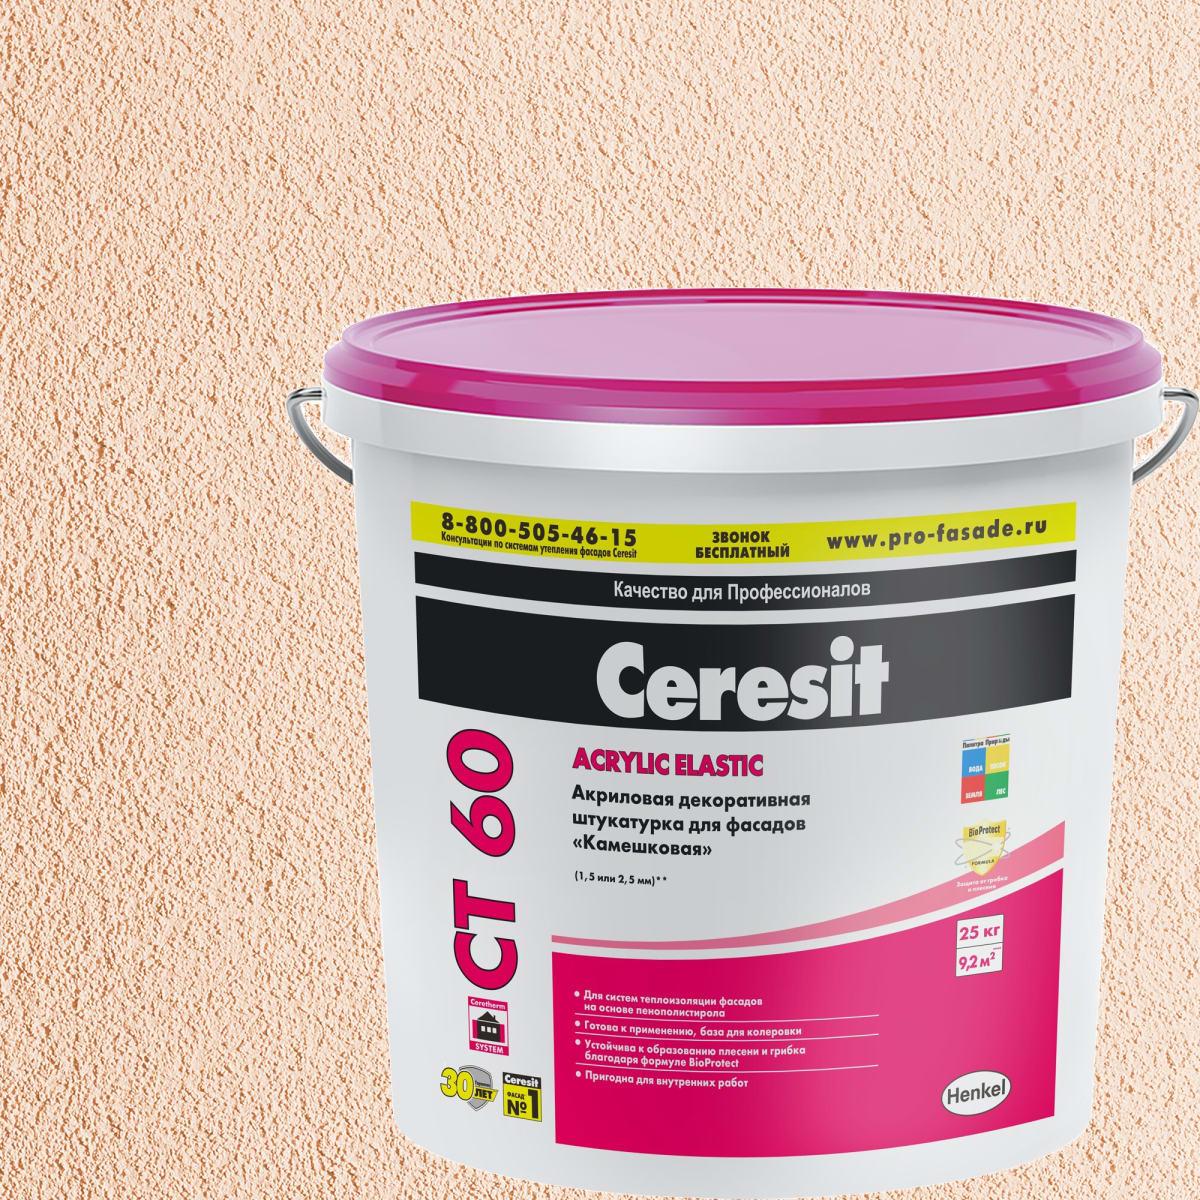 Штукатурка декоративная Ceresit СТ 60 Andalusia 2, эффект камешки, 25 кг